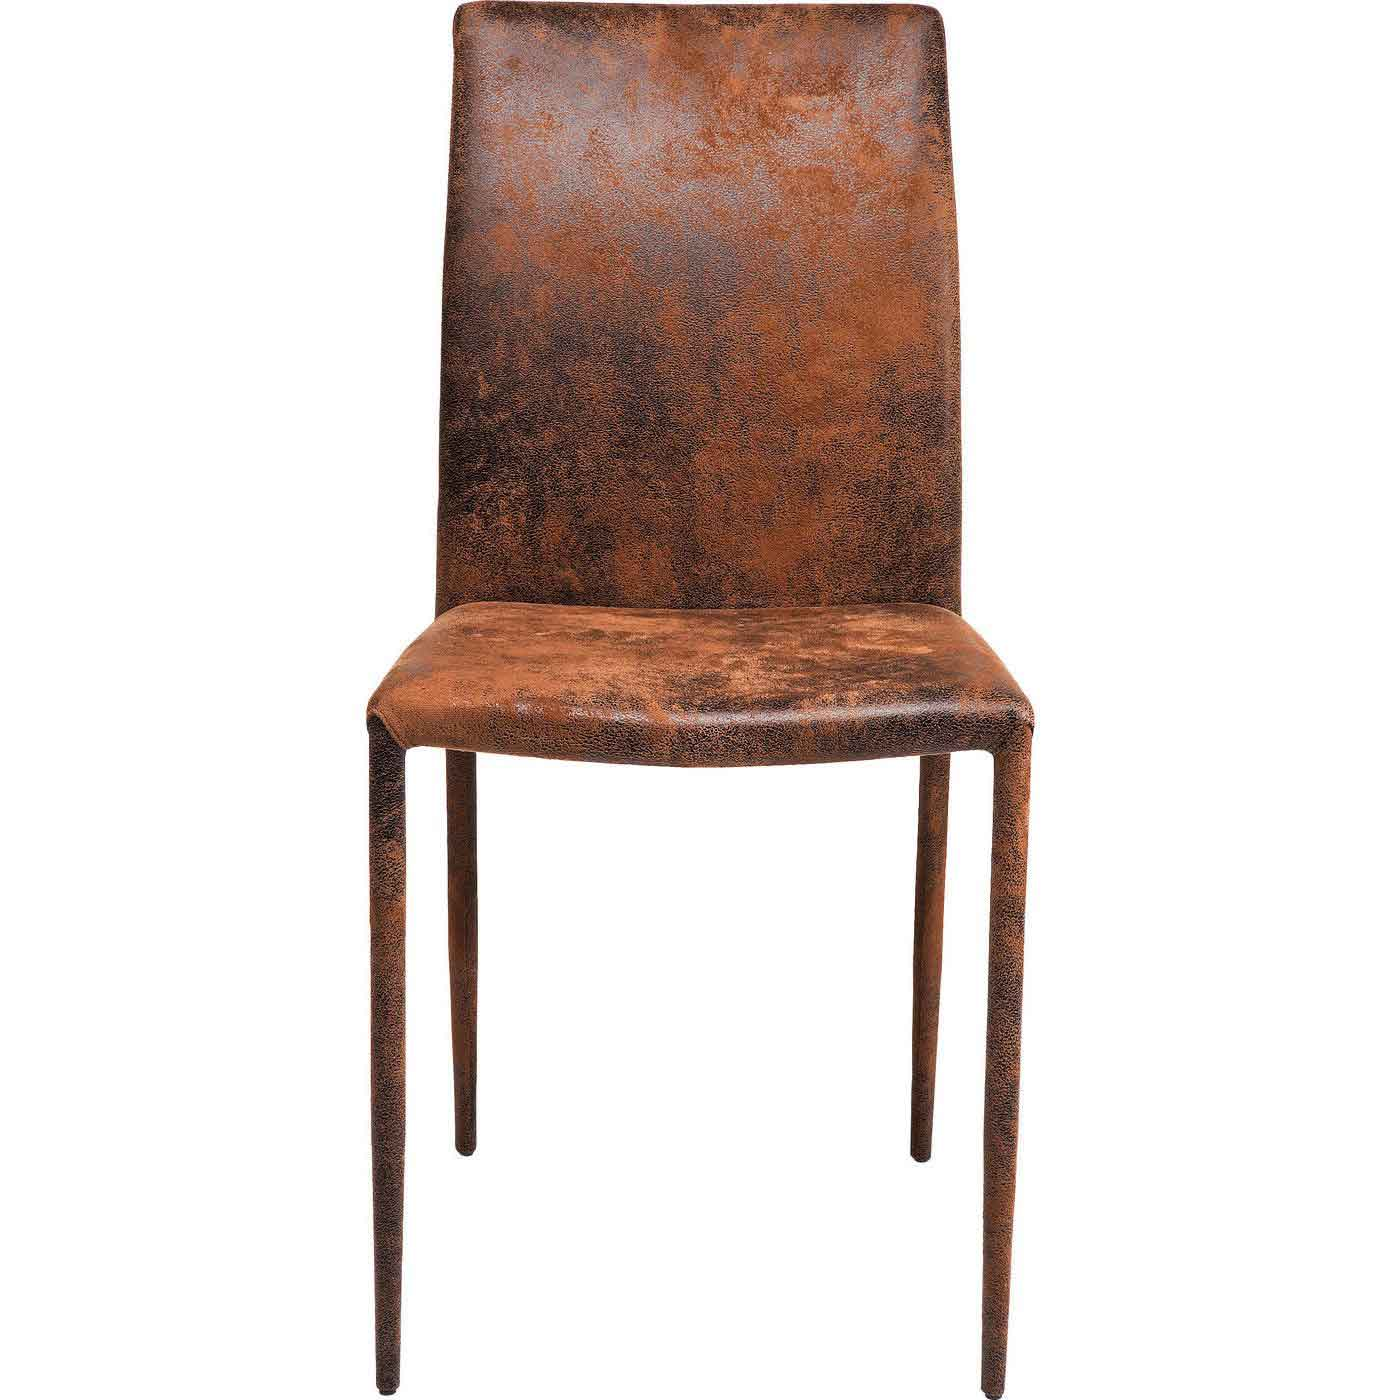 Kare design milano spisebordsstol - brun mikrofiber fra kare design fra boboonline.dk